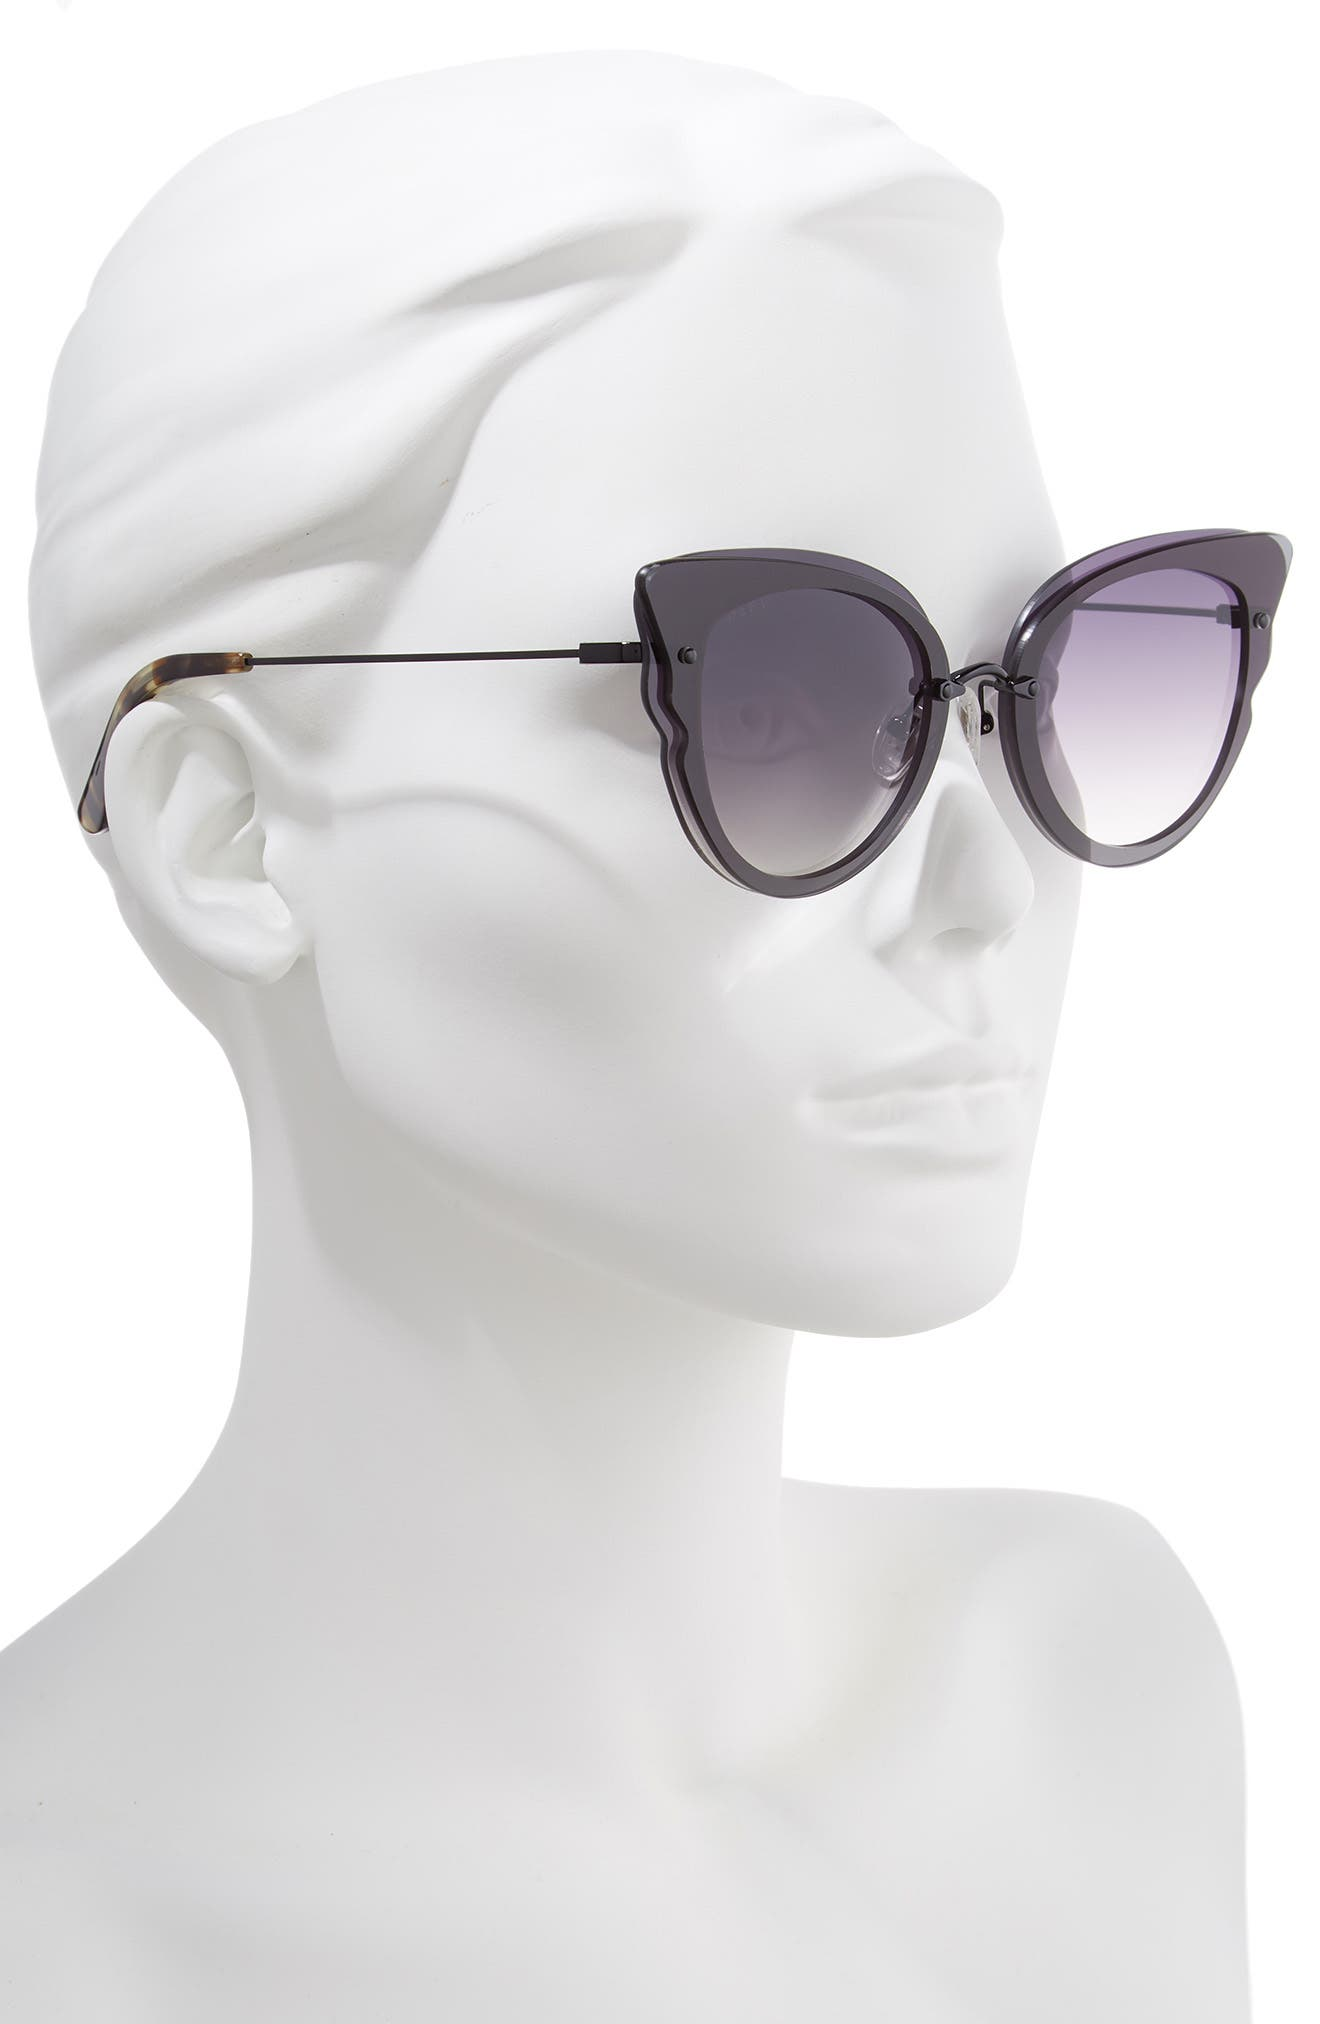 Delilah 49mm Cat Eye Sunglasses,                             Alternate thumbnail 2, color,                             BLACK/ GREY